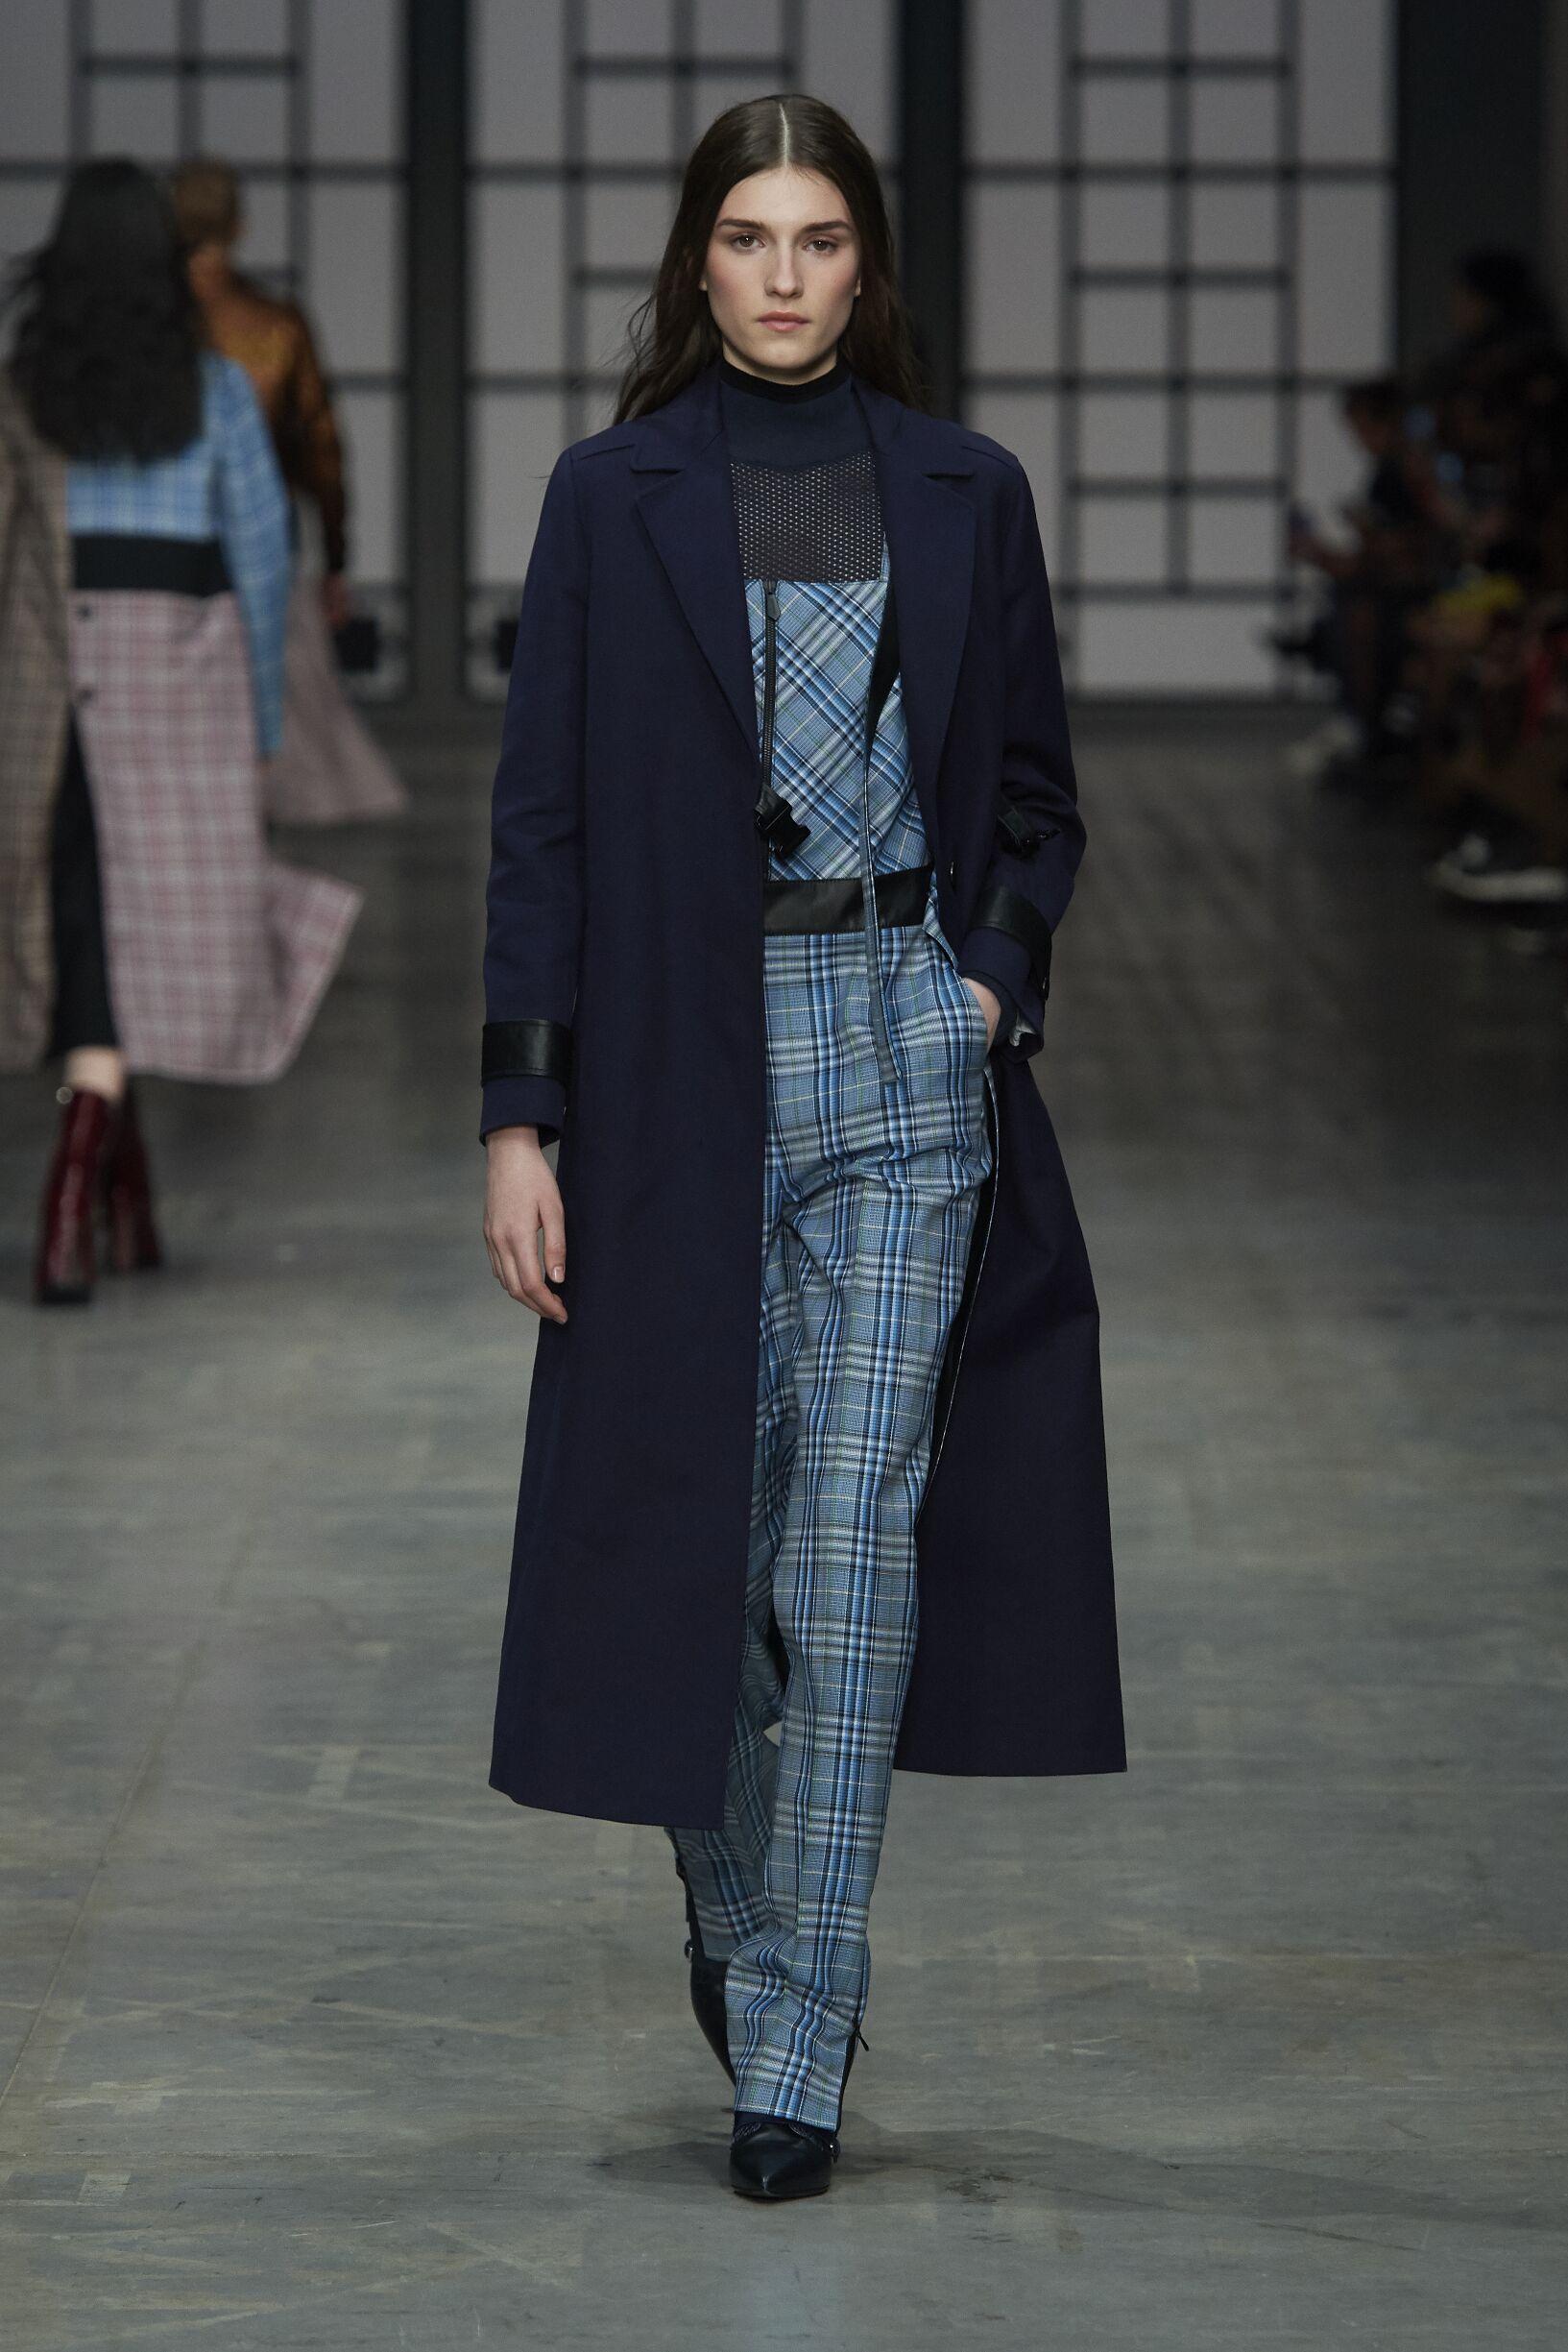 Woman FW 2018-19 Trussardi Fashion Show Milan